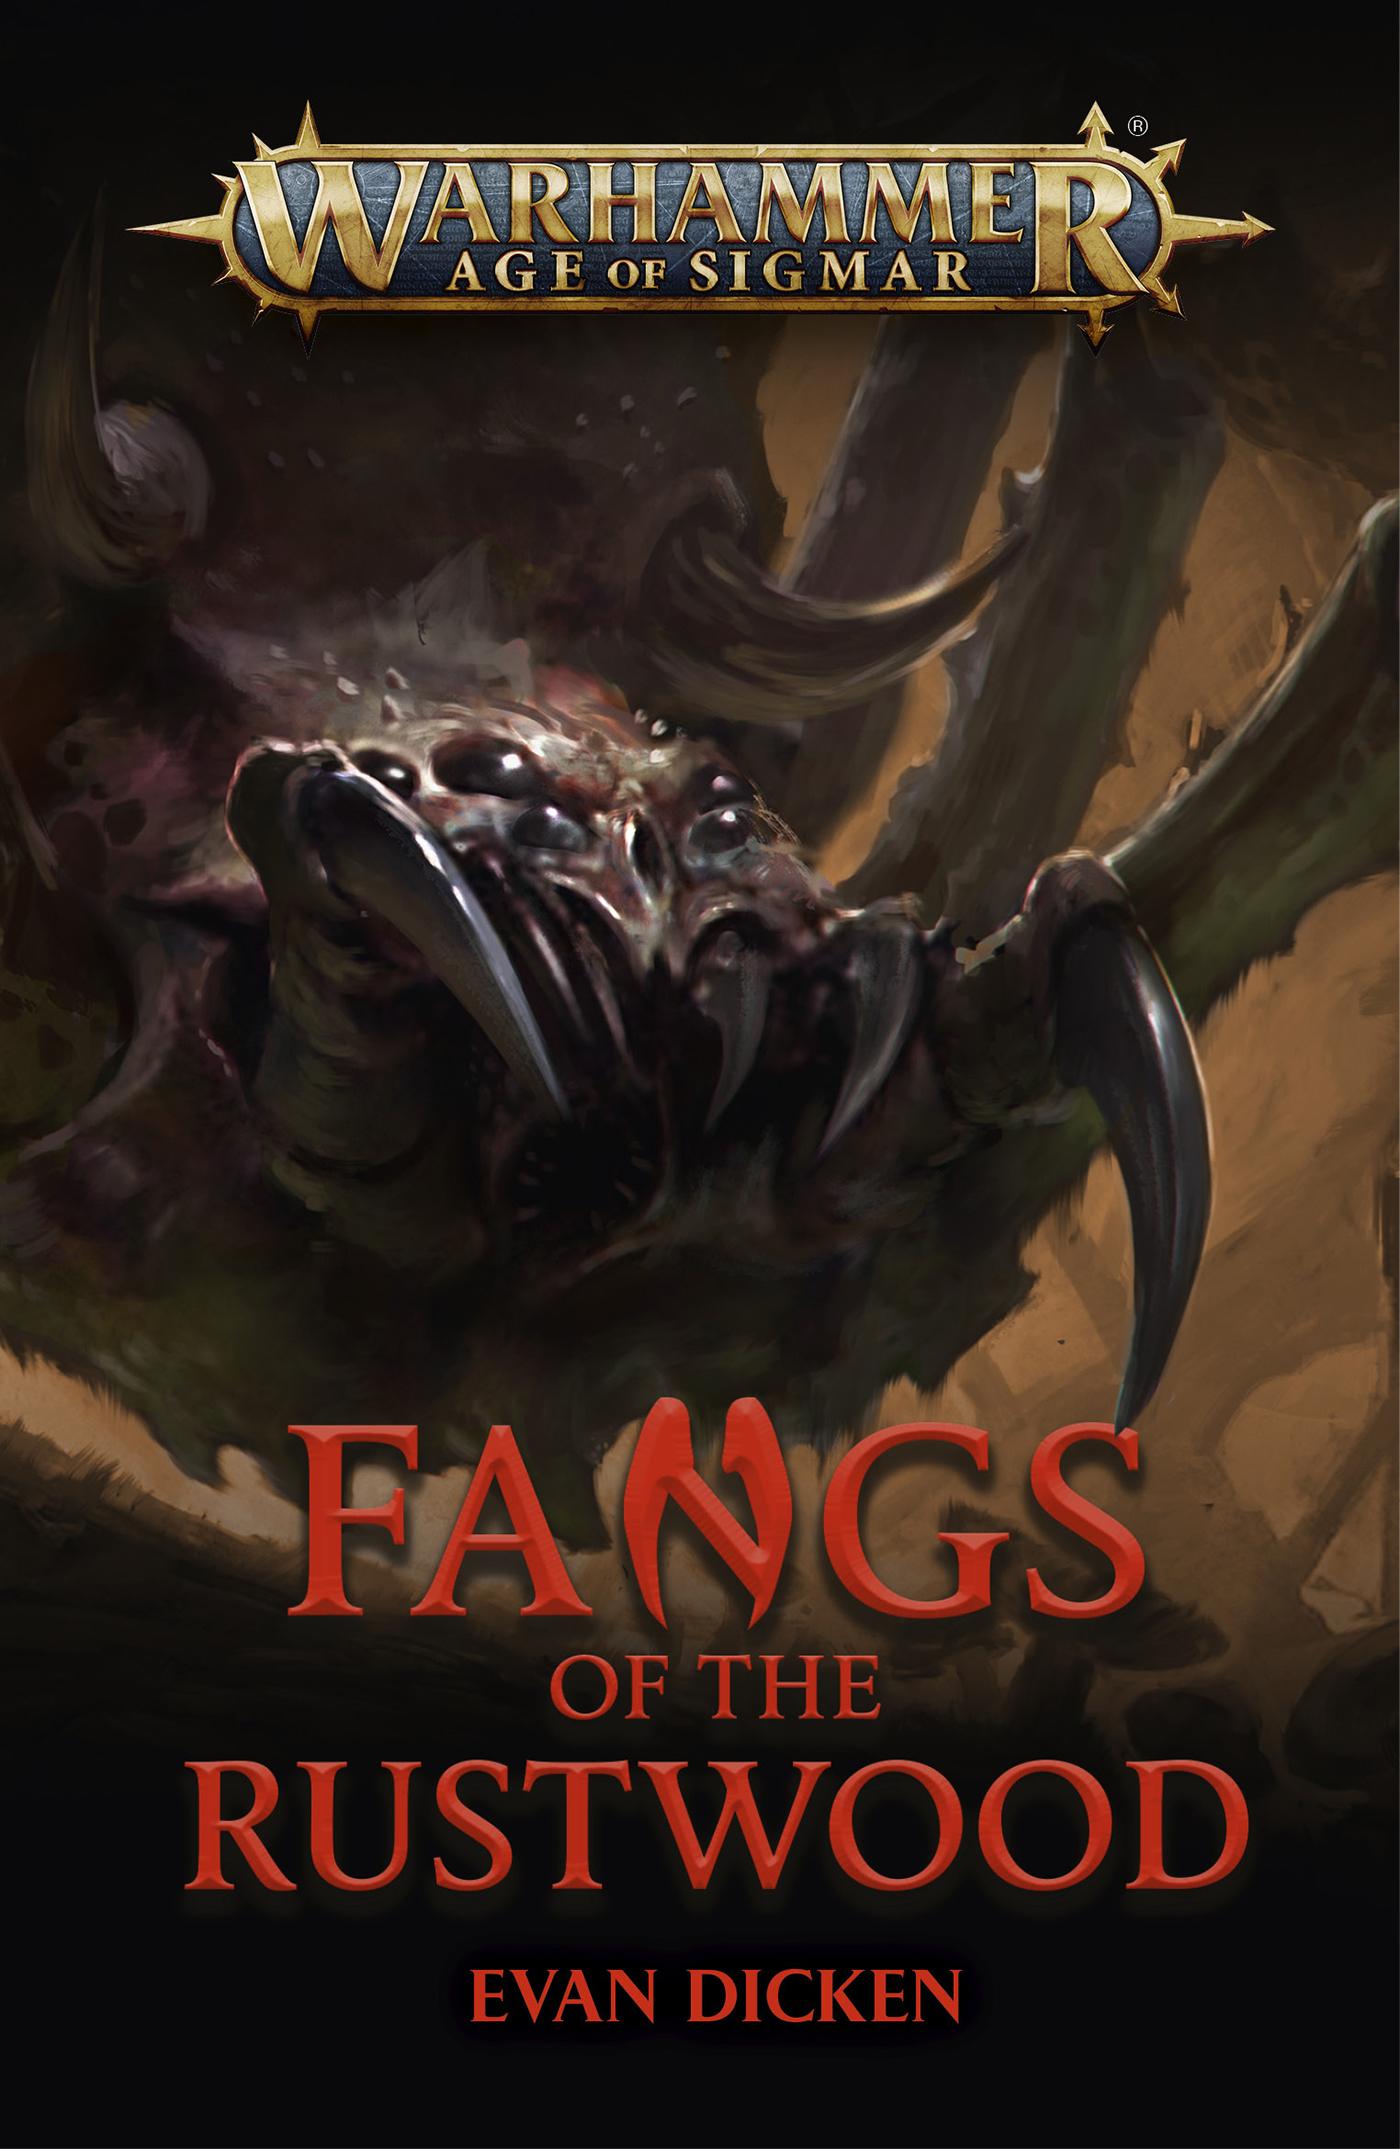 Fangs of the Rustwood by Evan Dicken